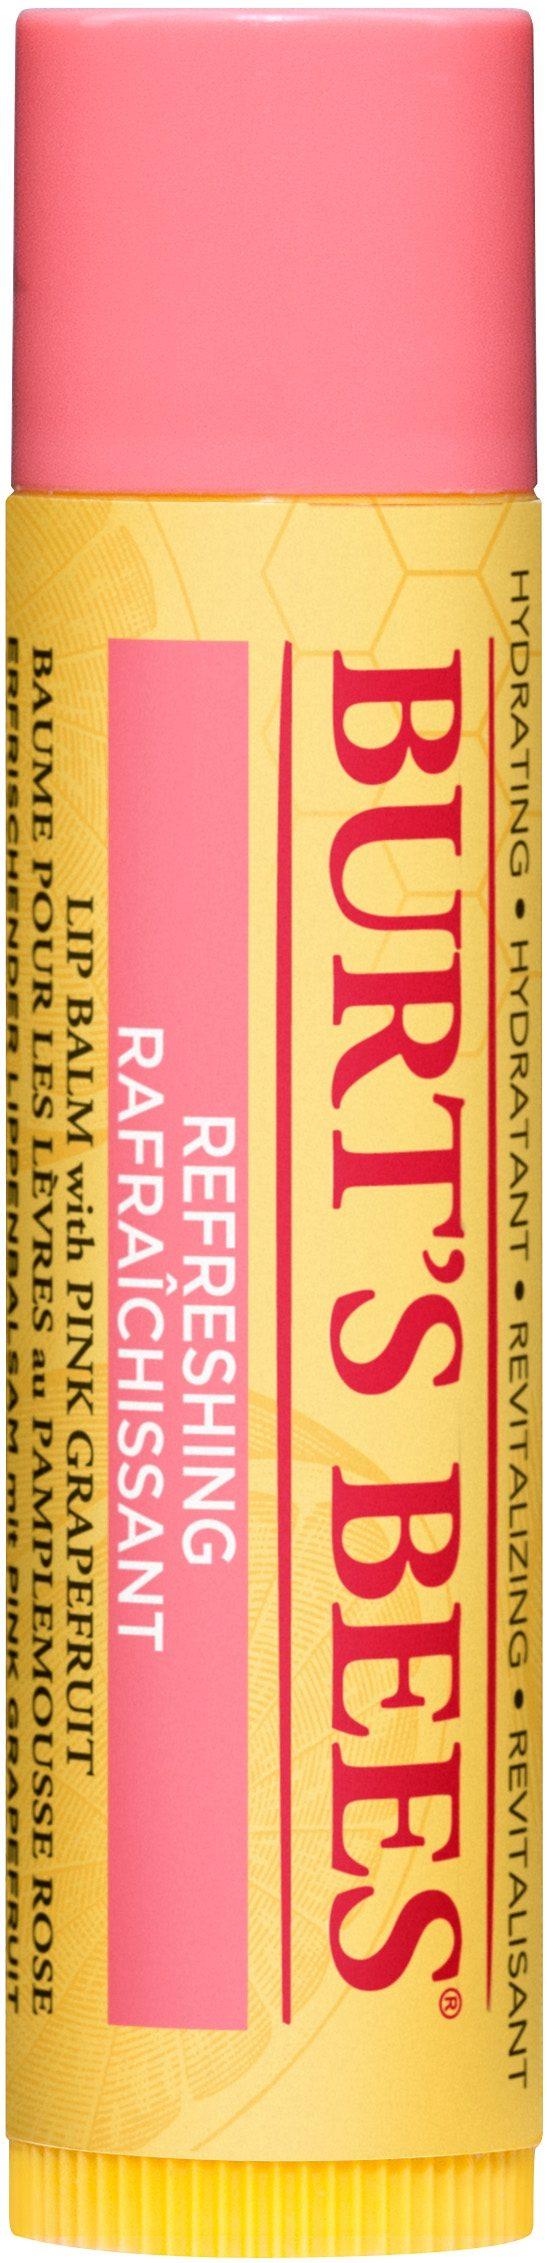 Burt's Bees, »Pink Grapefruit Lip Balm Stick«, Lippenbalsam, 4,25 g